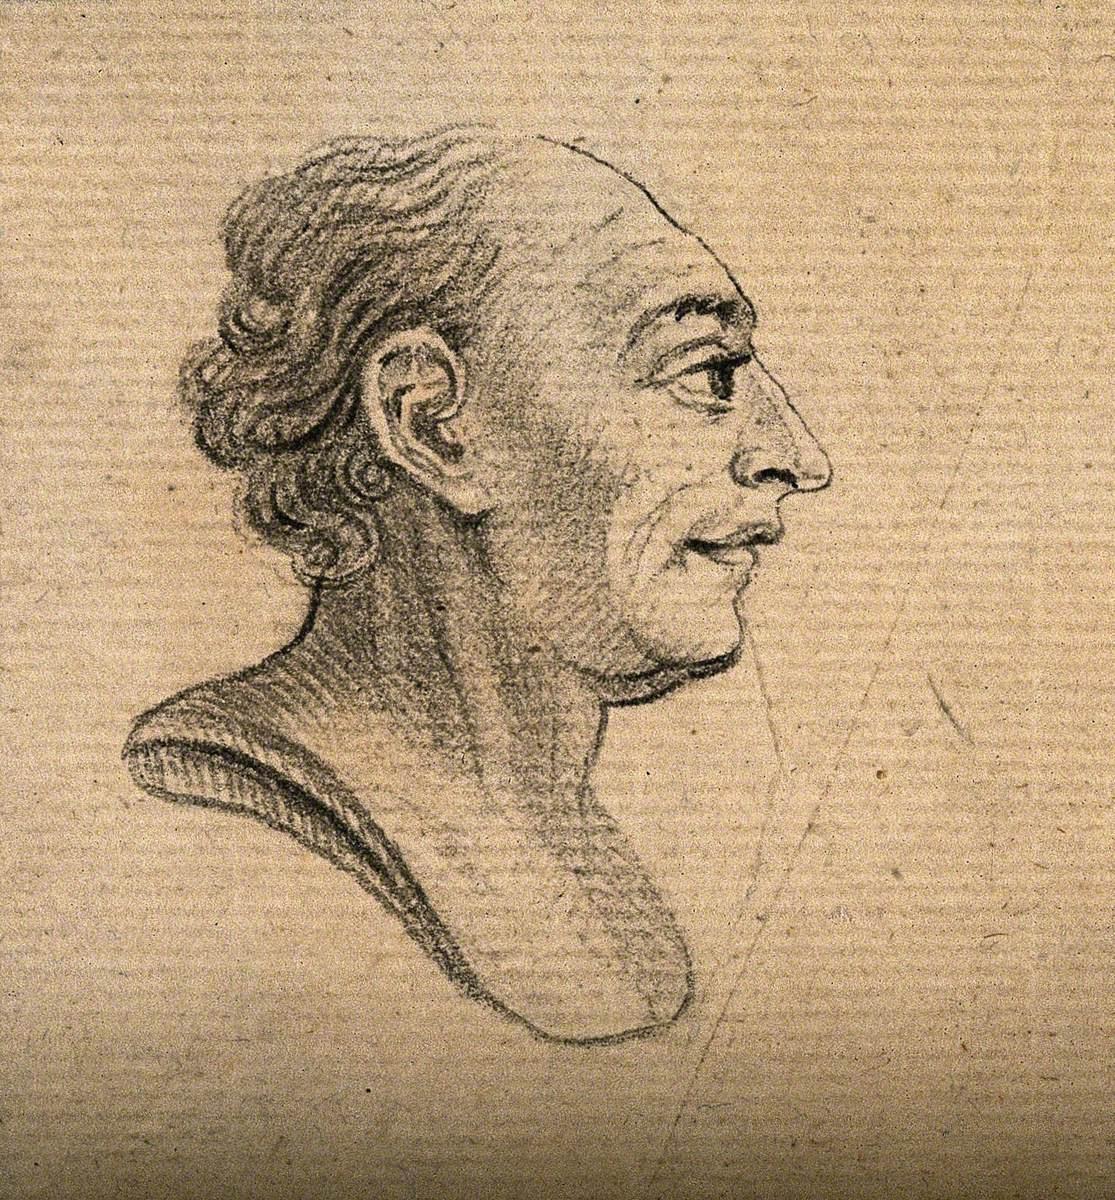 A Bust Showing a Phlegmatic-Sanguine Temperament